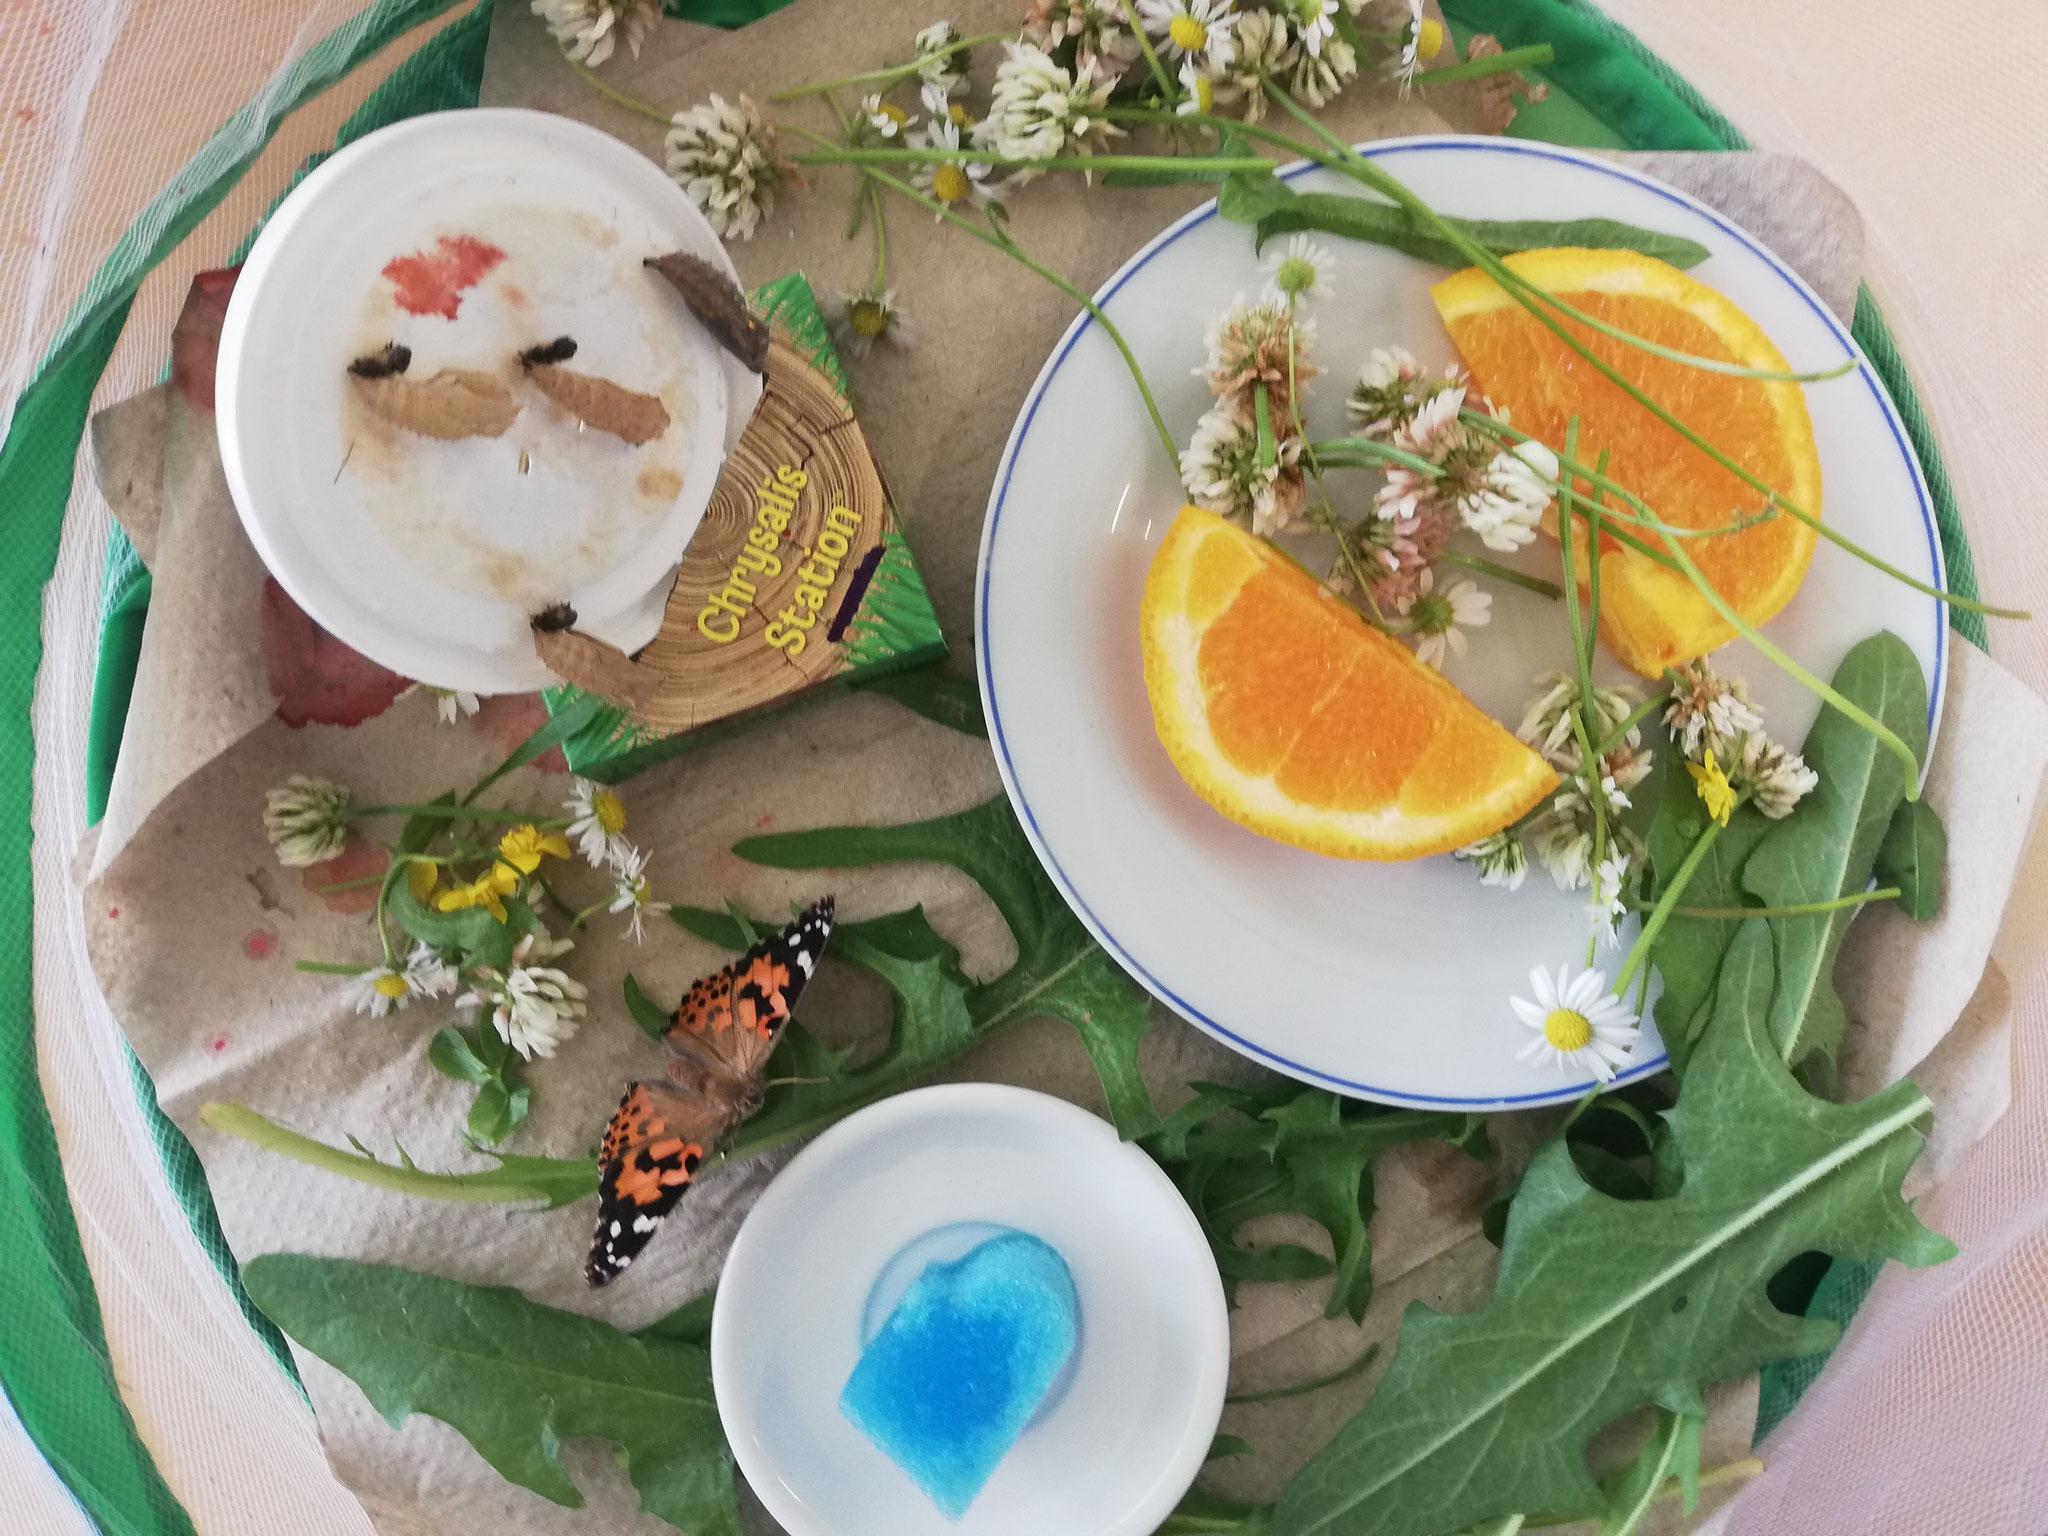 Schmetterlingshabitat mit lauter Leckereien...